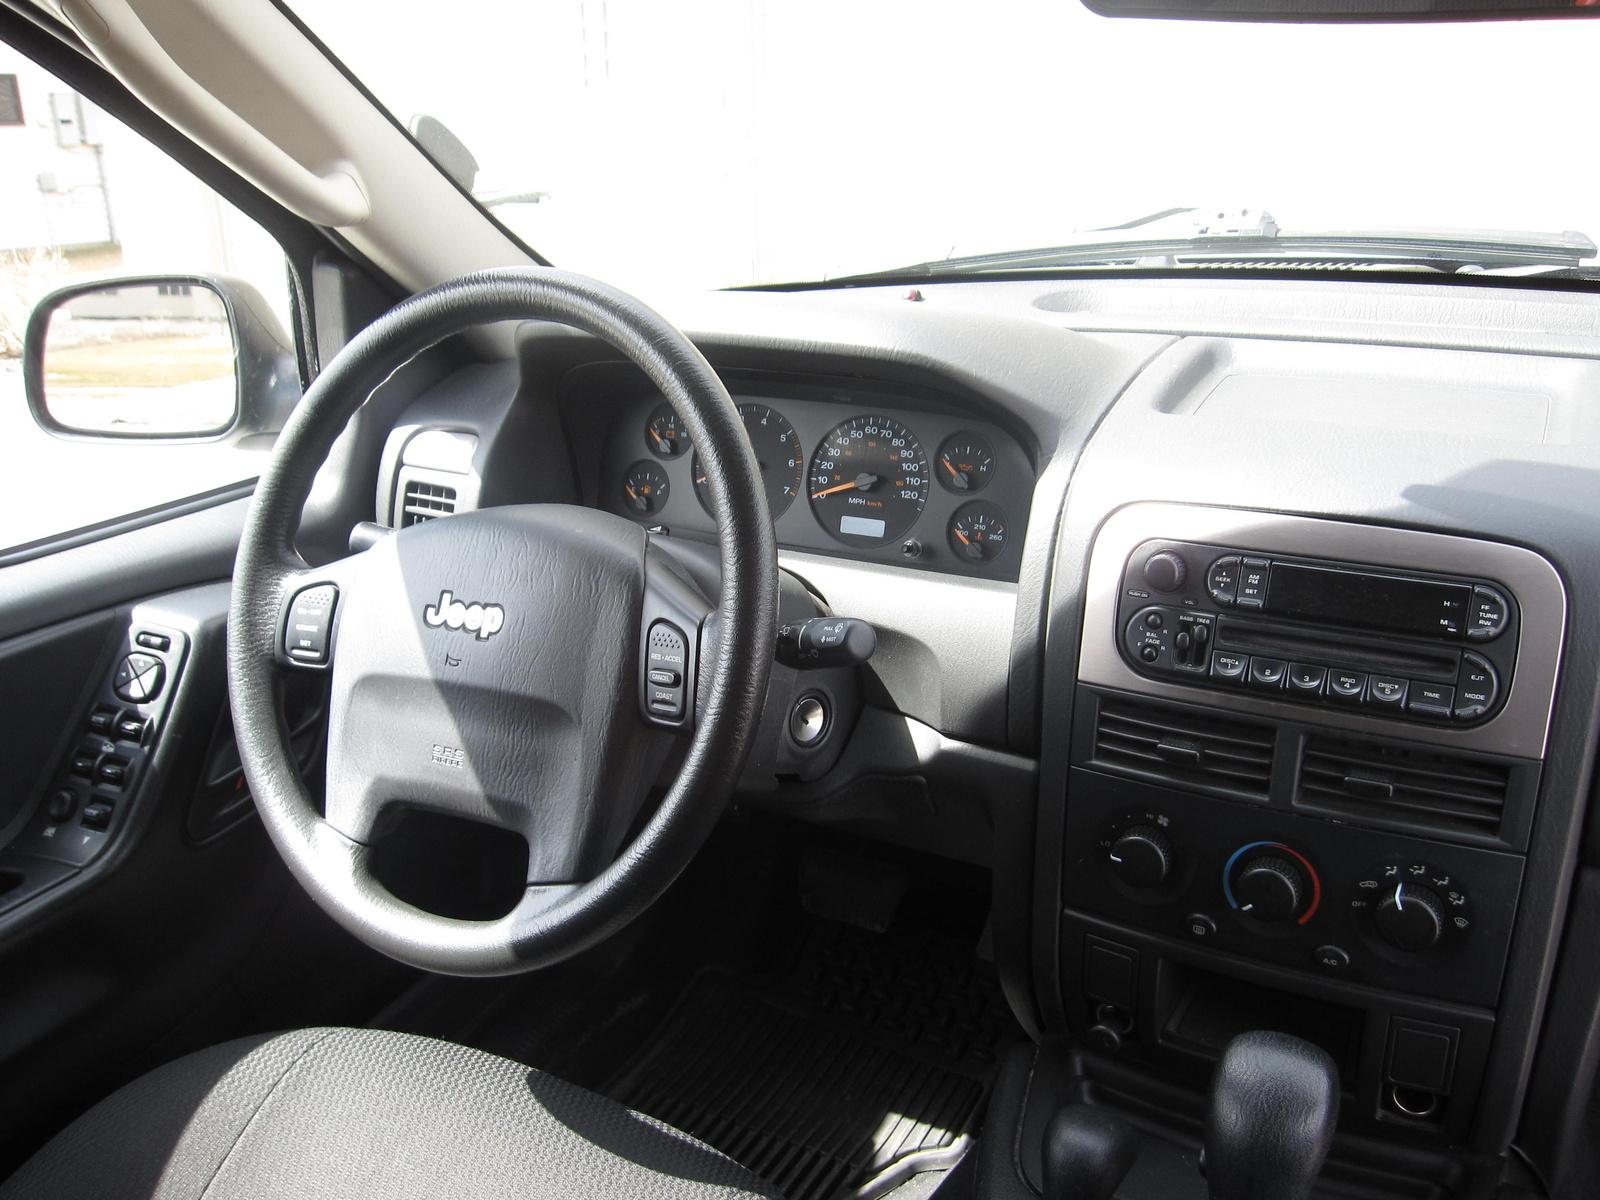 2004 jeep grand cherokee interior for 2004 jeep grand cherokee interior